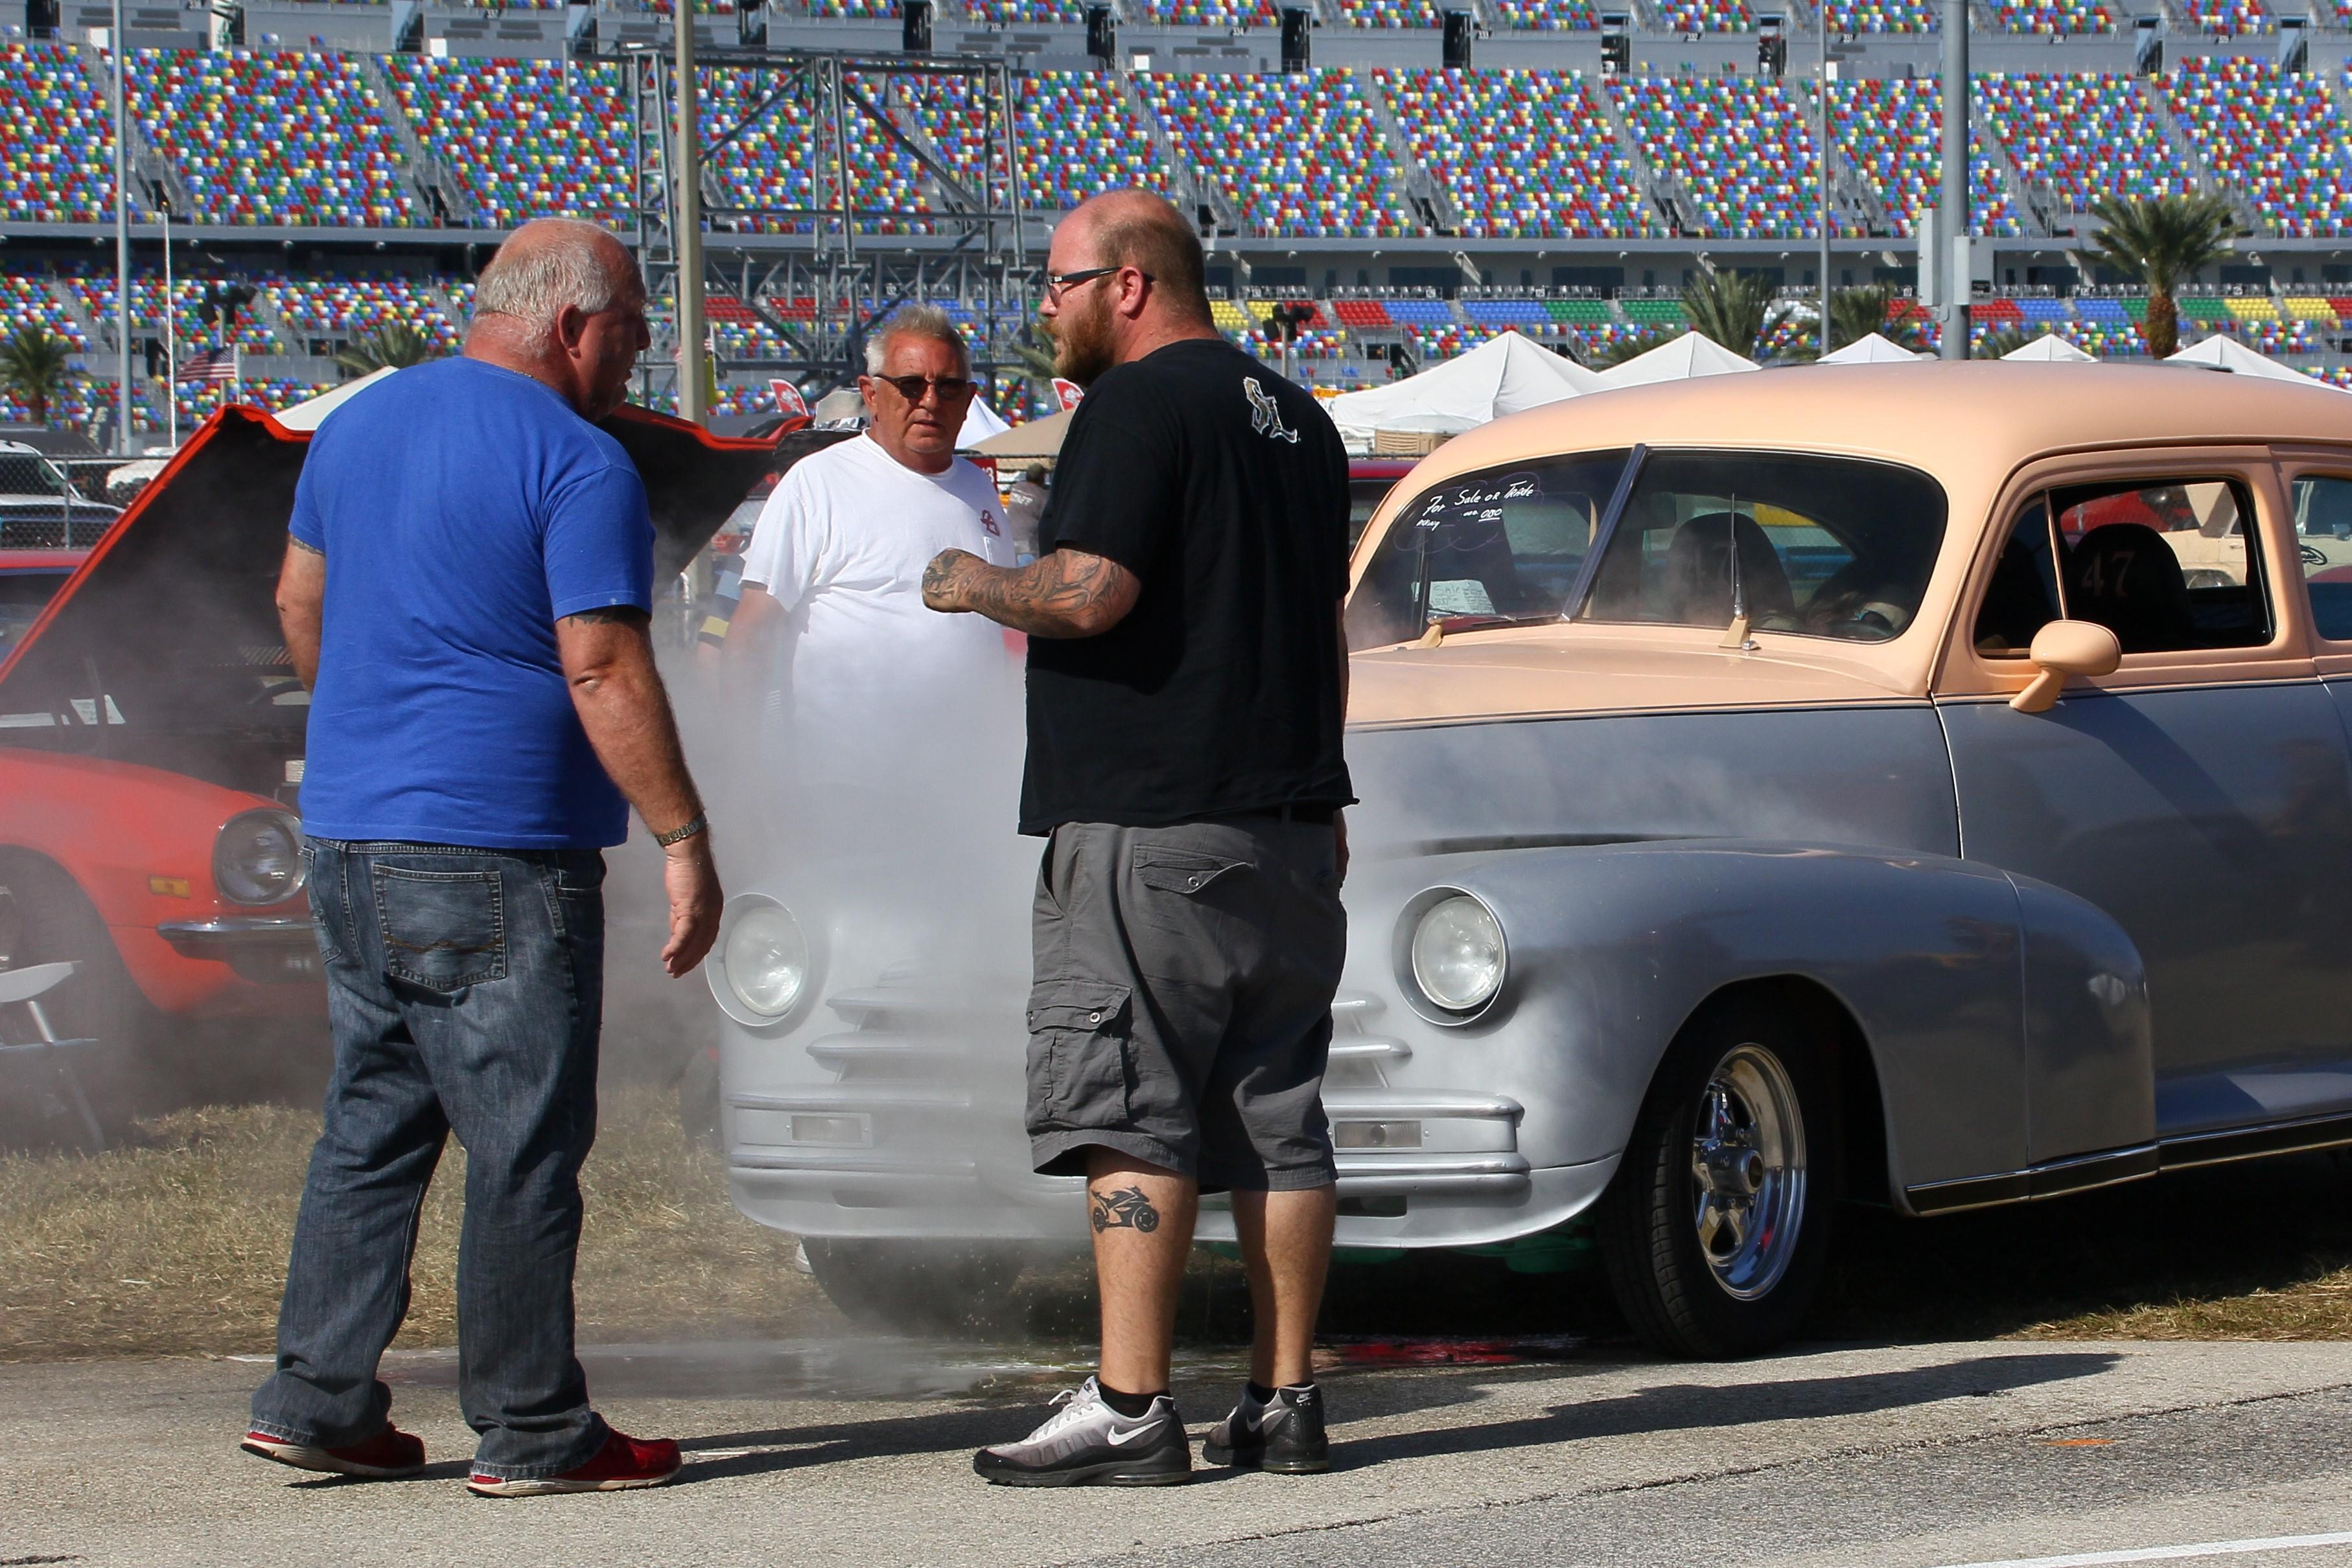 Shots from the 2016 Daytona Turkey Run – RacingJunk News